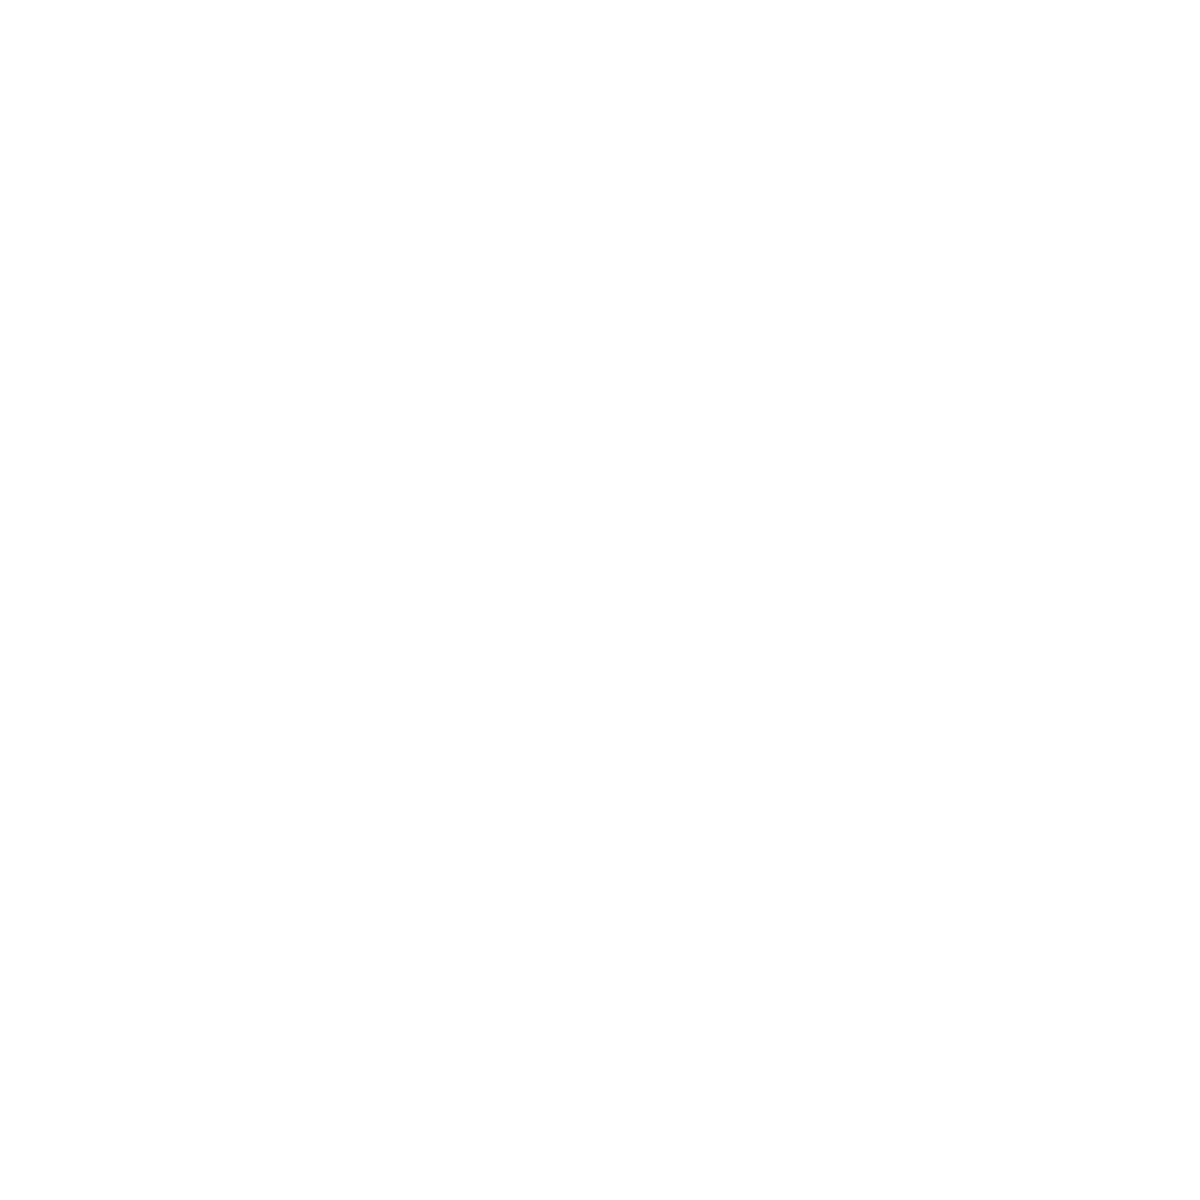 Crack 64 revit version 2015 bit download with free full Revit 2015